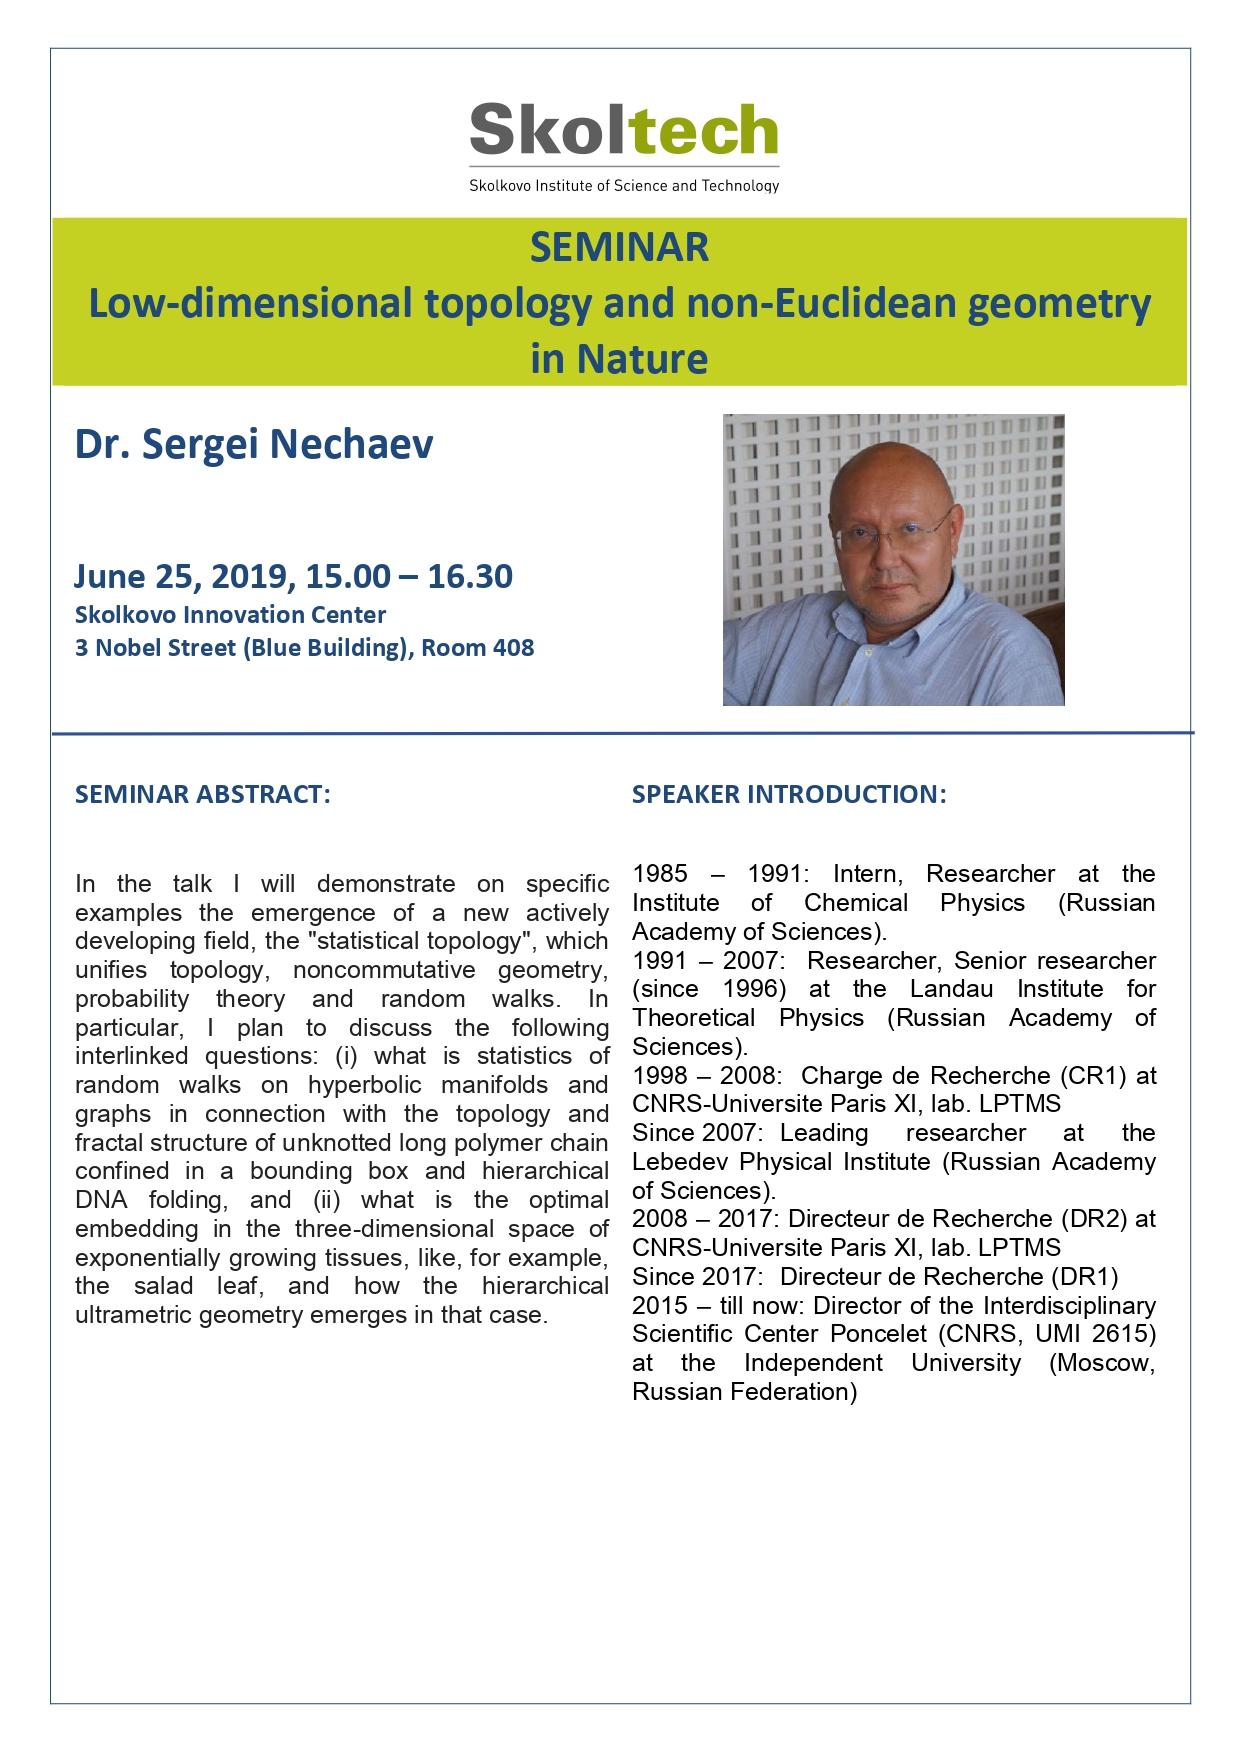 cdise-seminar-announcement_nechaev_25jun2019